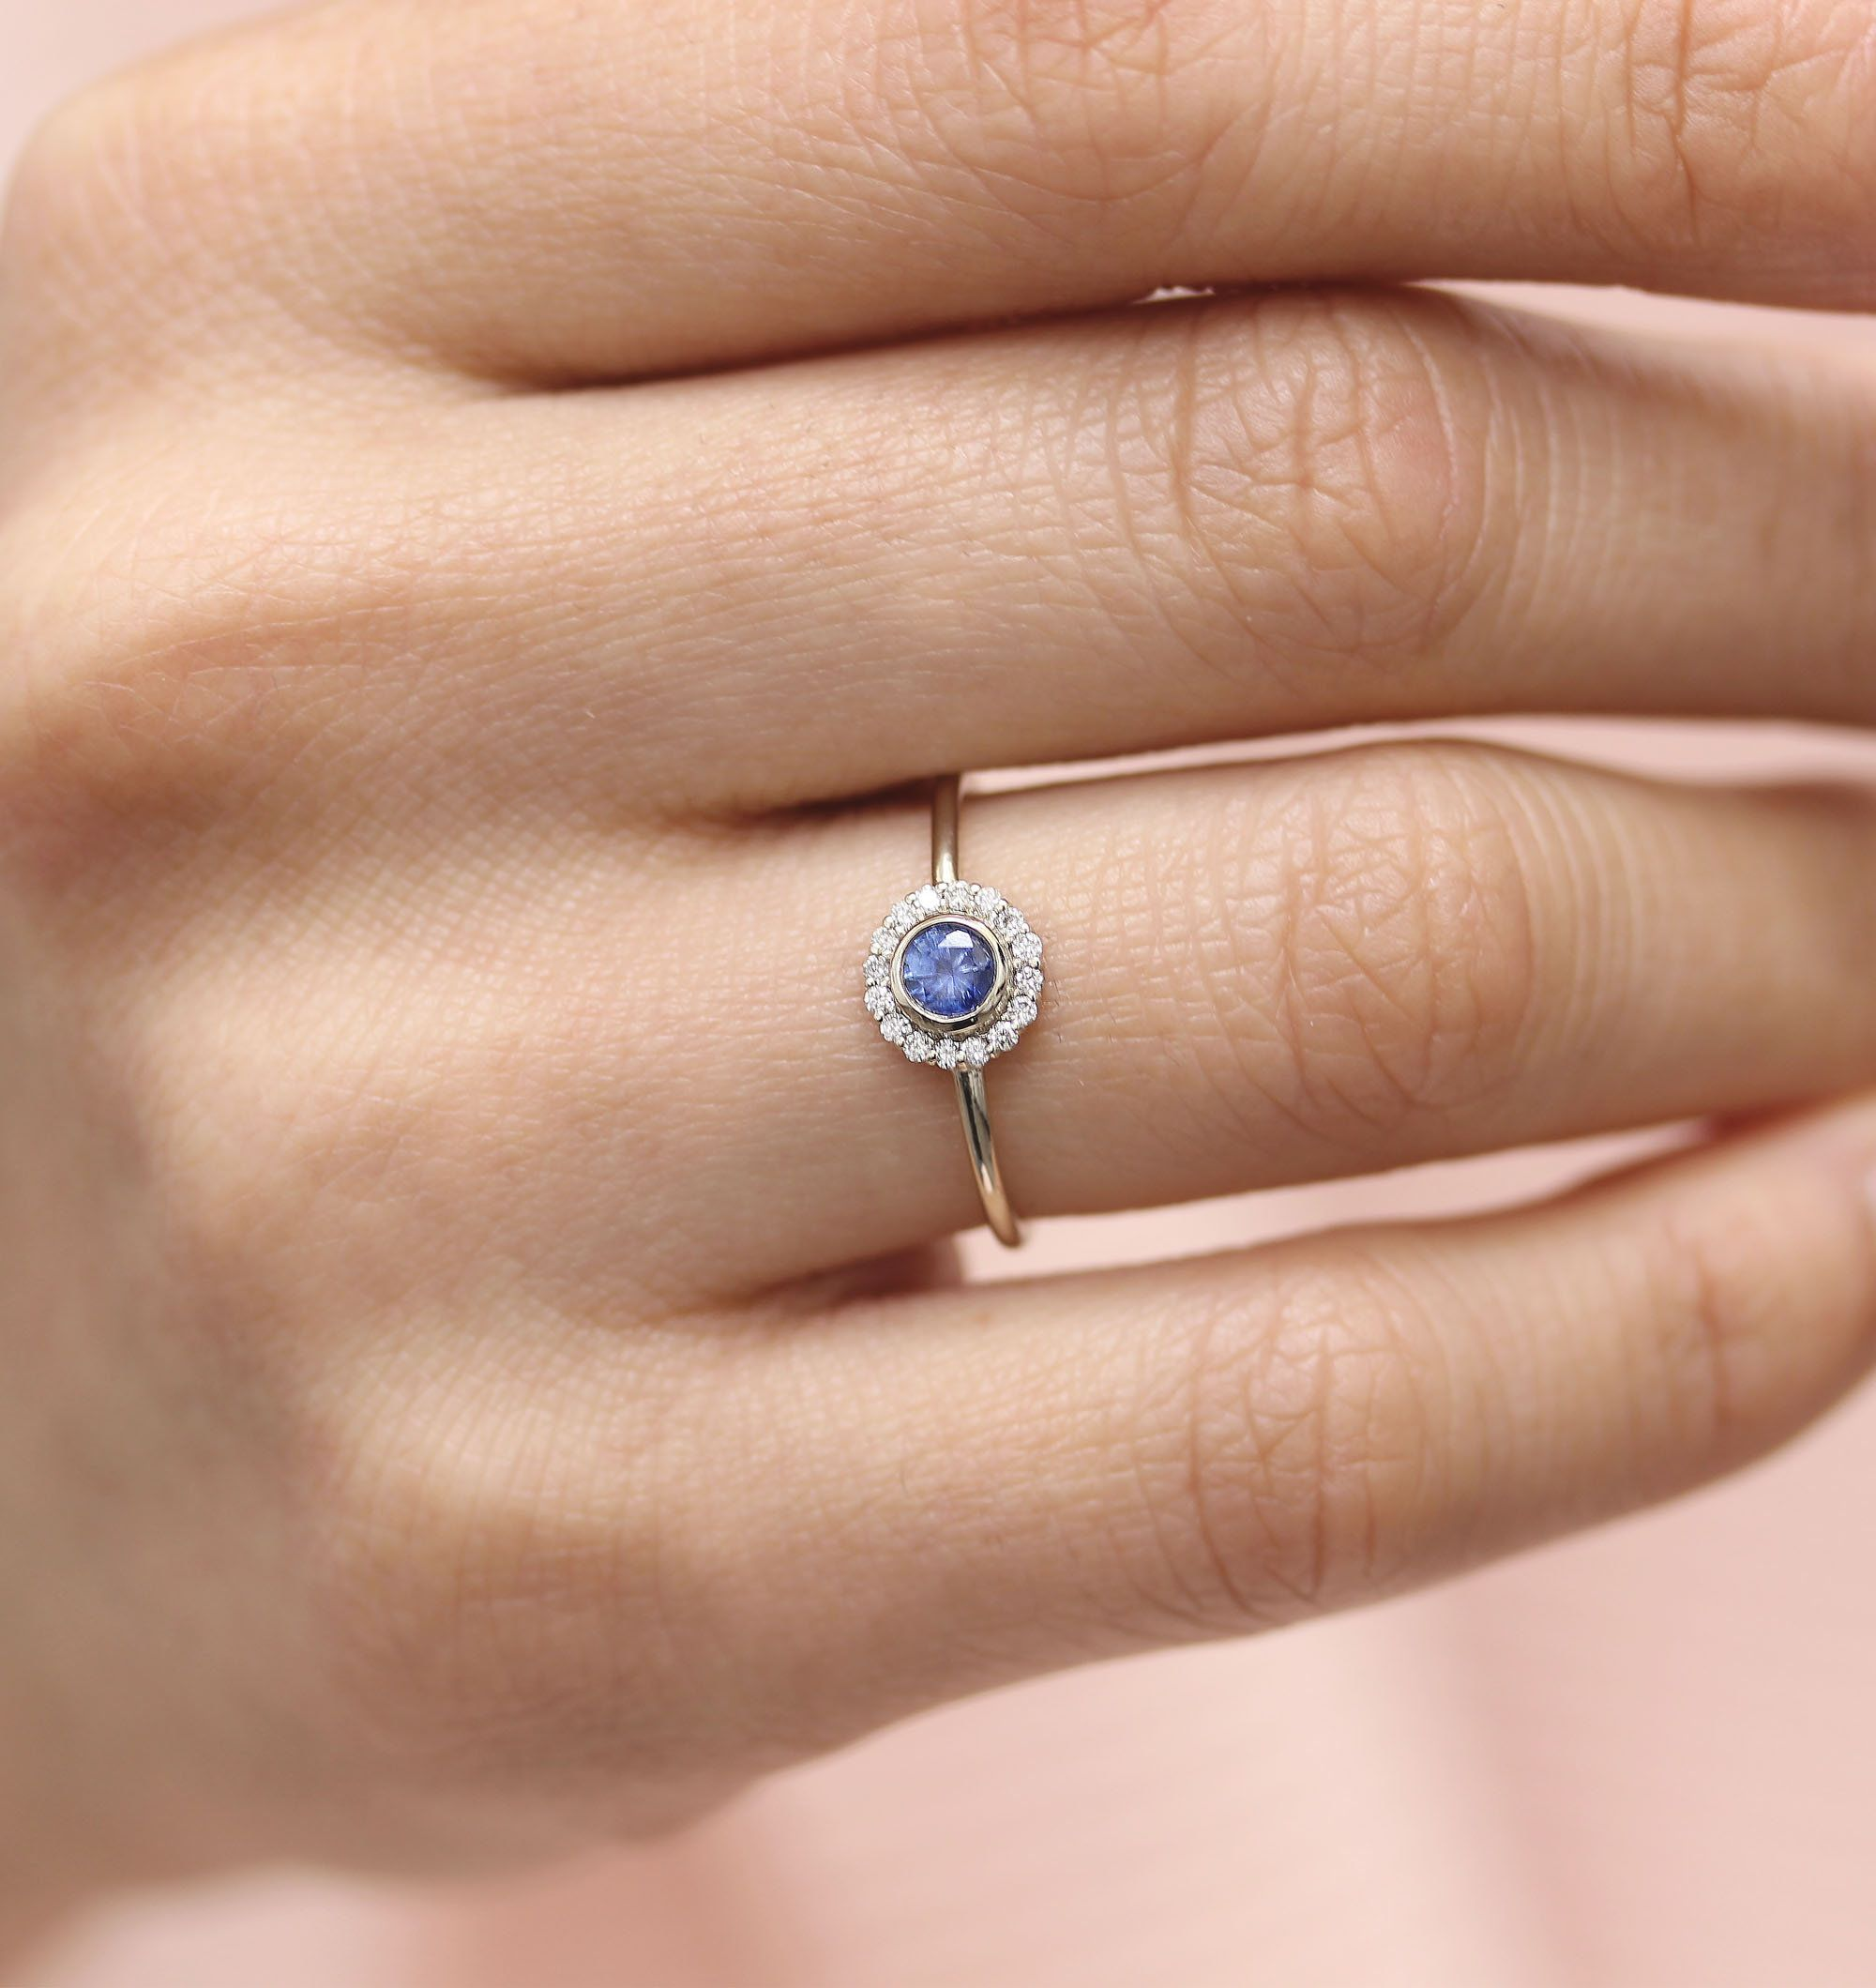 Blue Sapphire Diamond Engagement Ring 14k White Gold